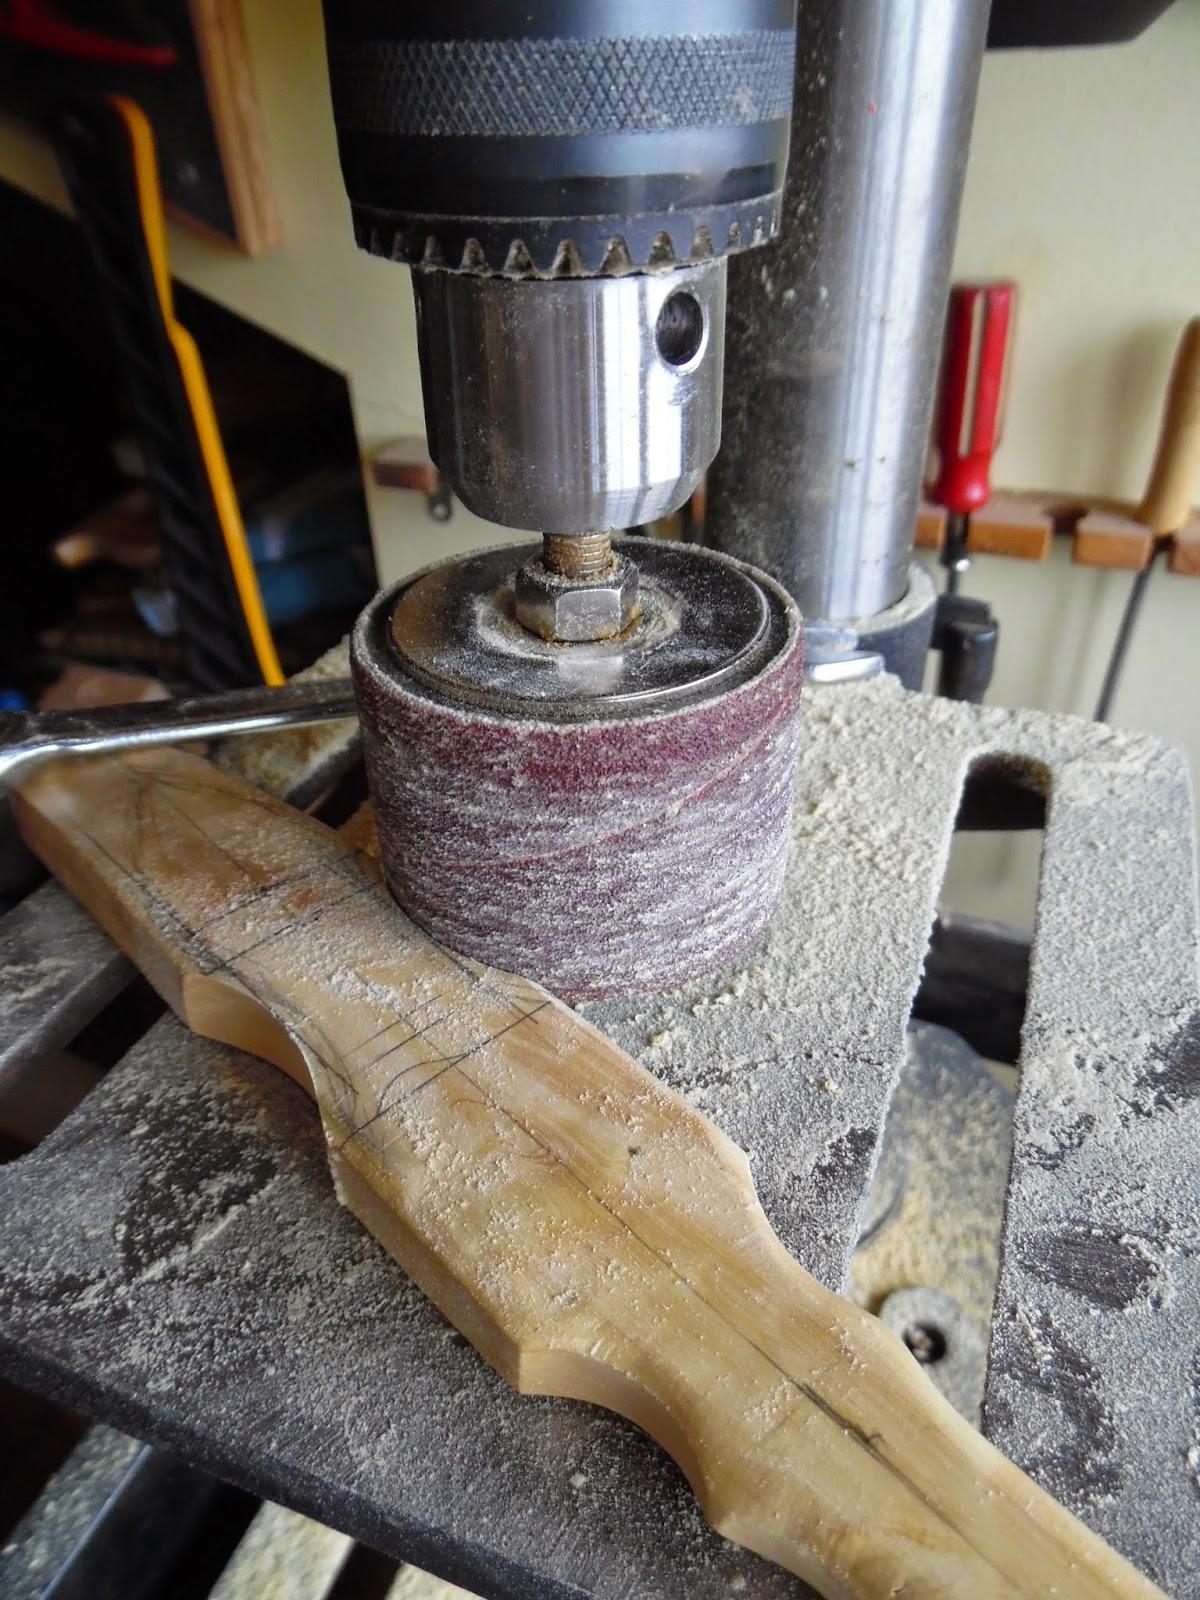 El rinc n de un aprendiz una esp tula en madera de boj - Lijas para taladro ...